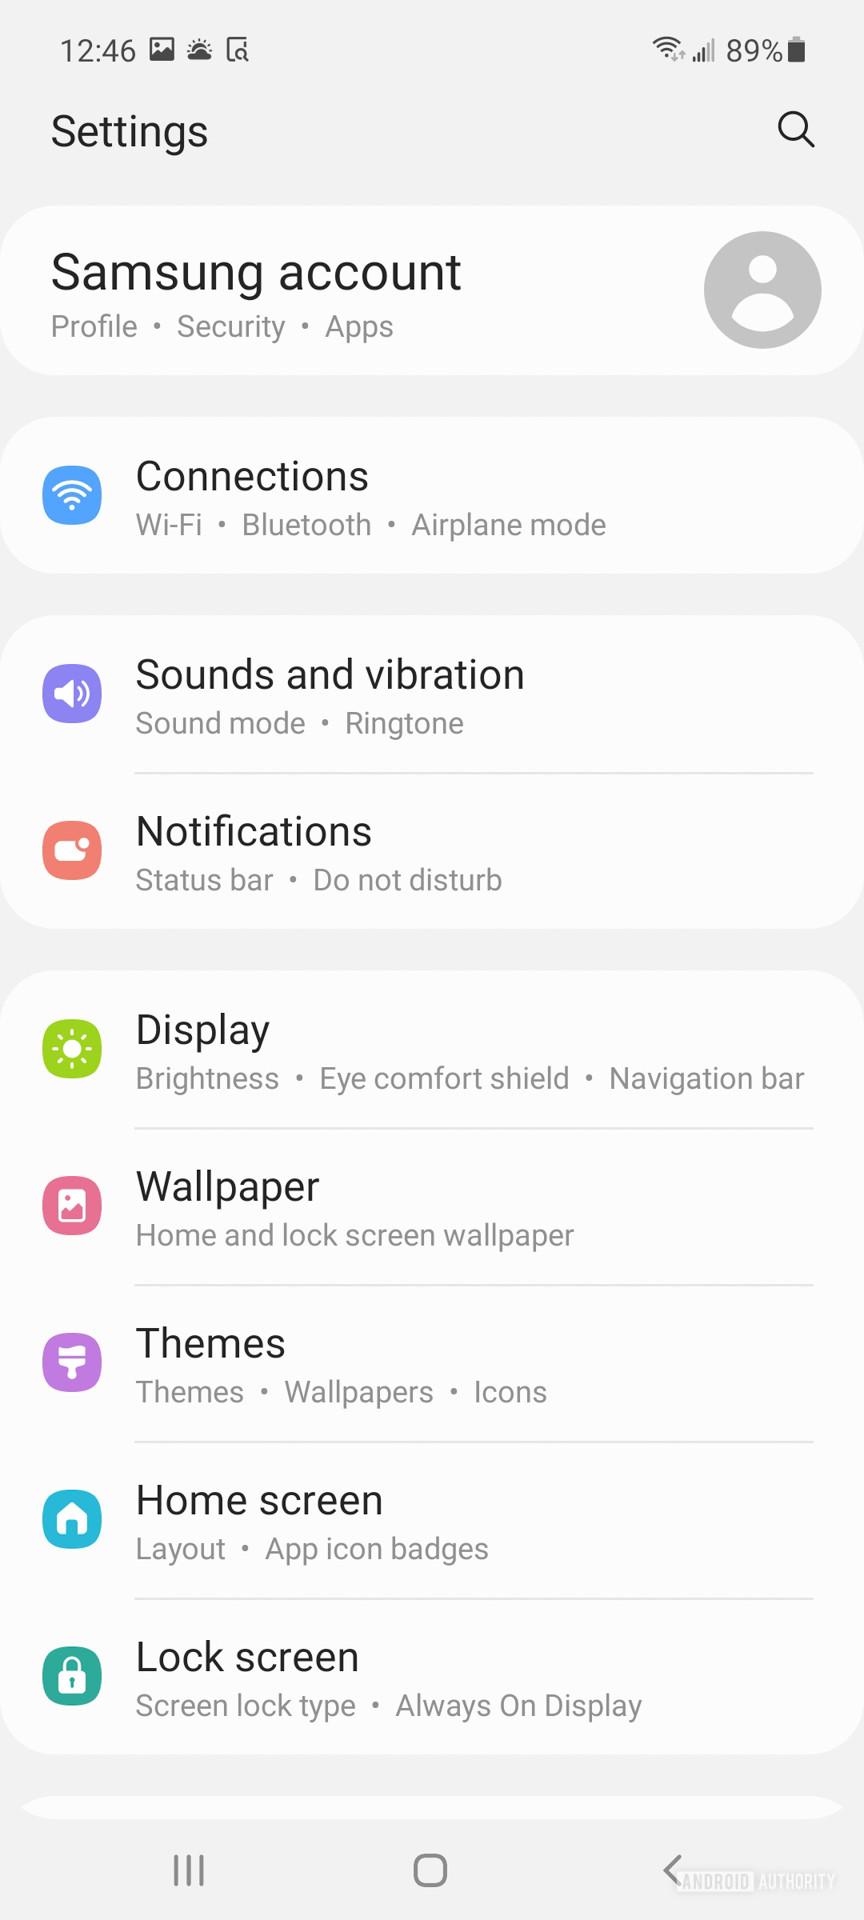 Samsung Galaxy A52 5G settings screen